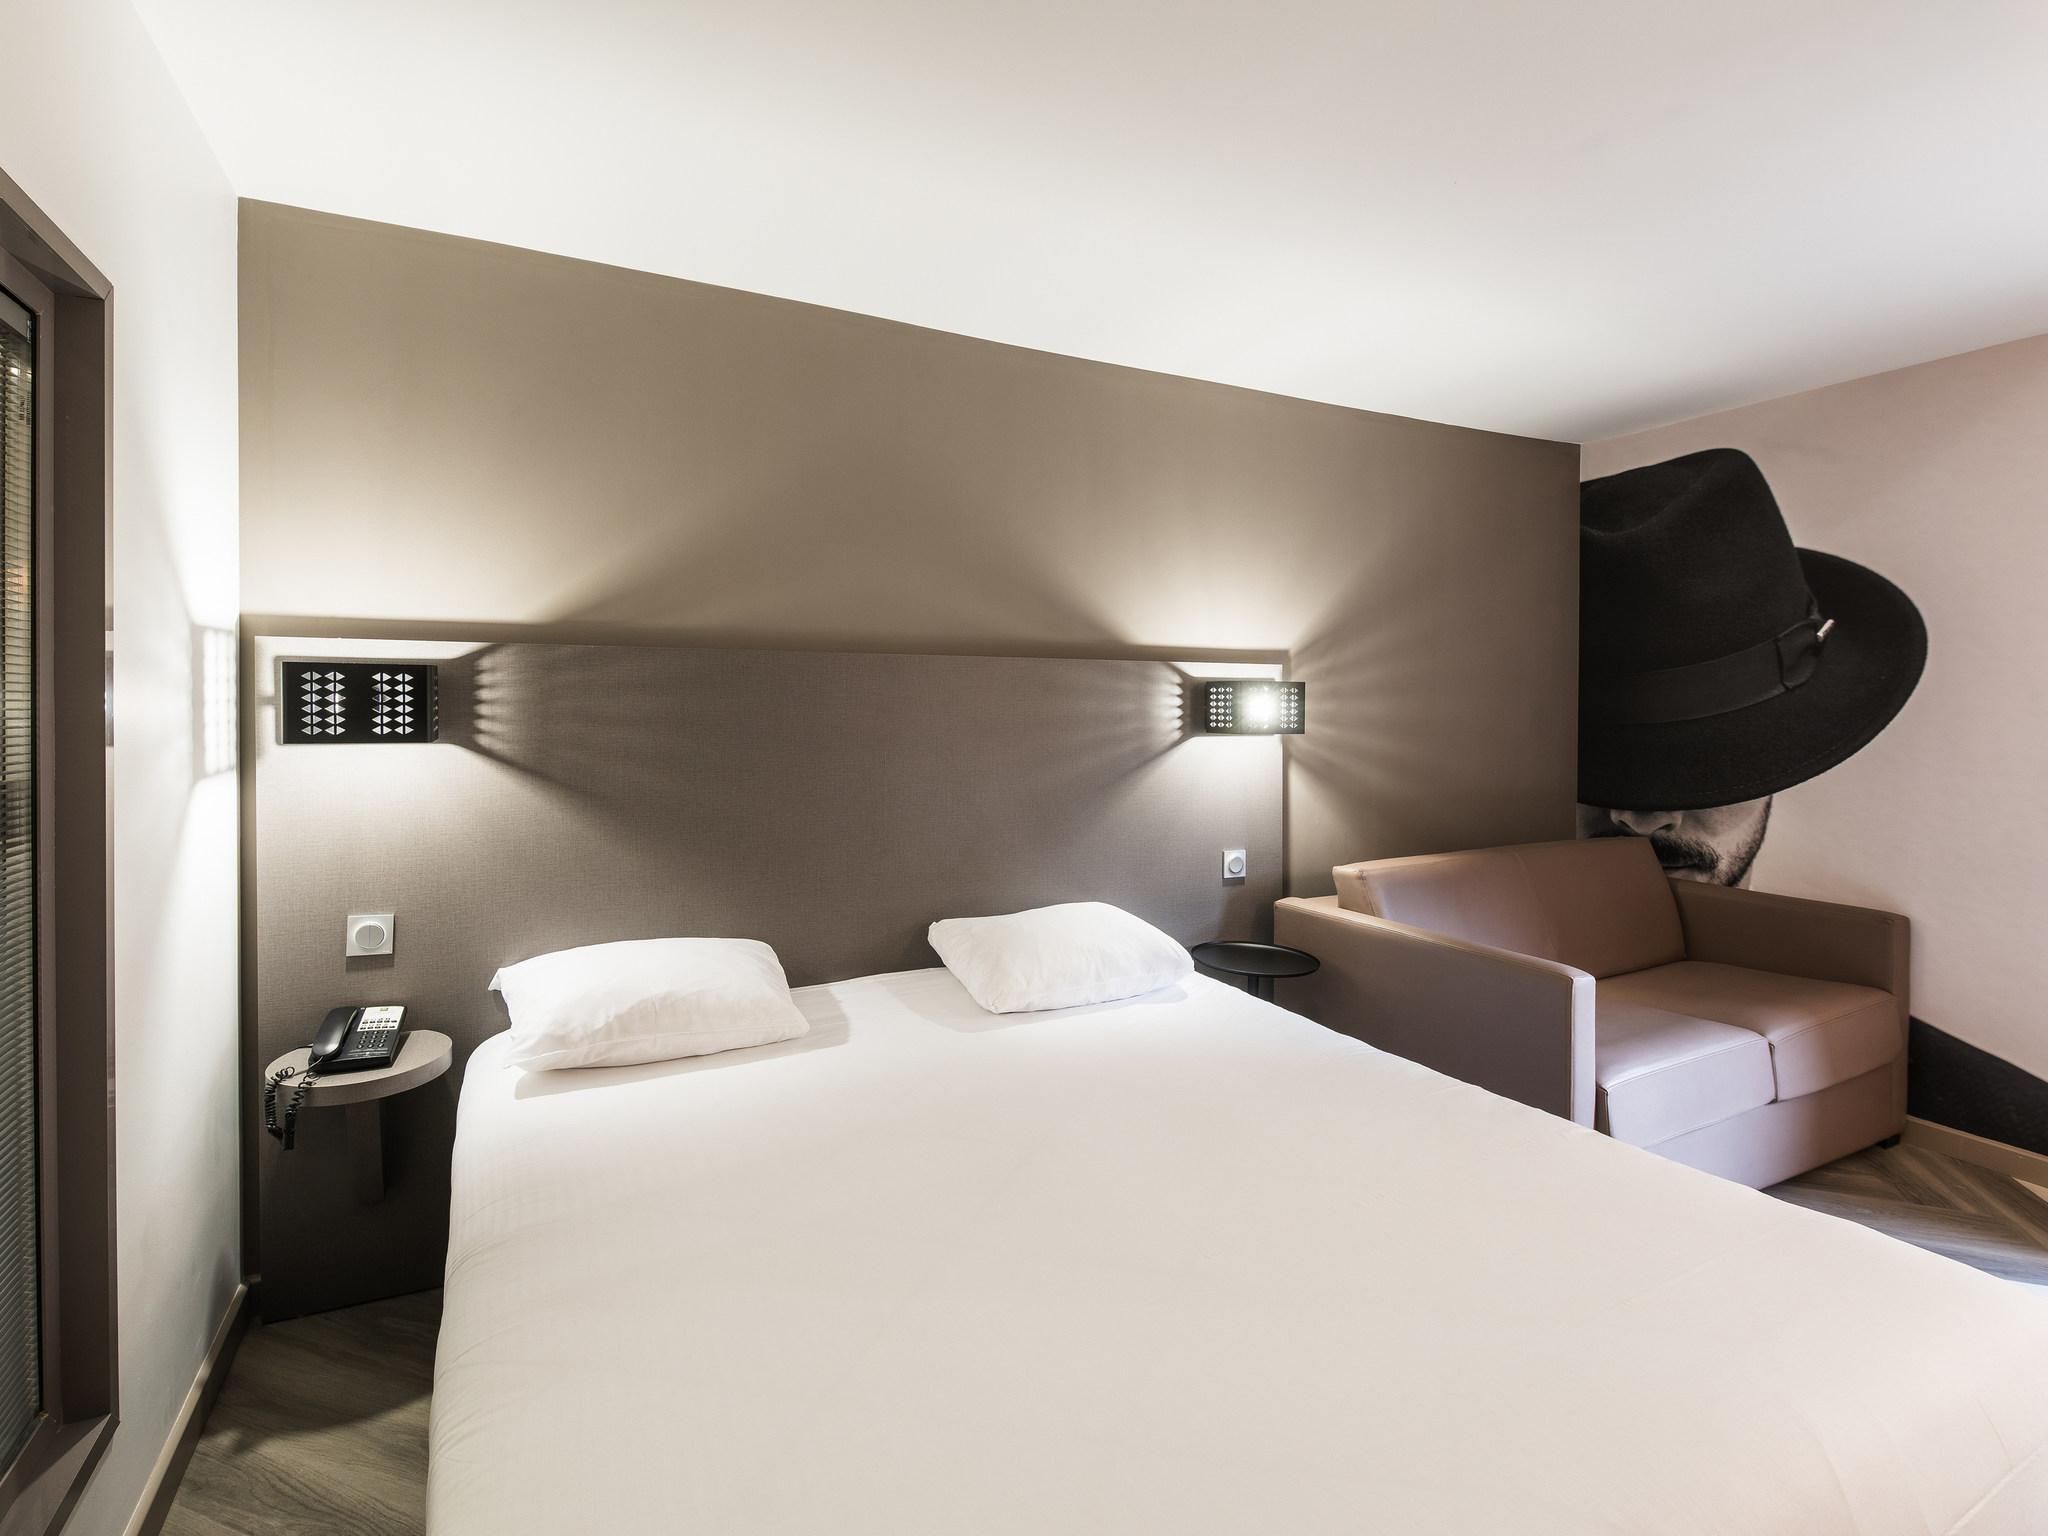 Hôtel à NICE Ibis Styles Nice VieuxPort - Hotel ibis vieux port marseille